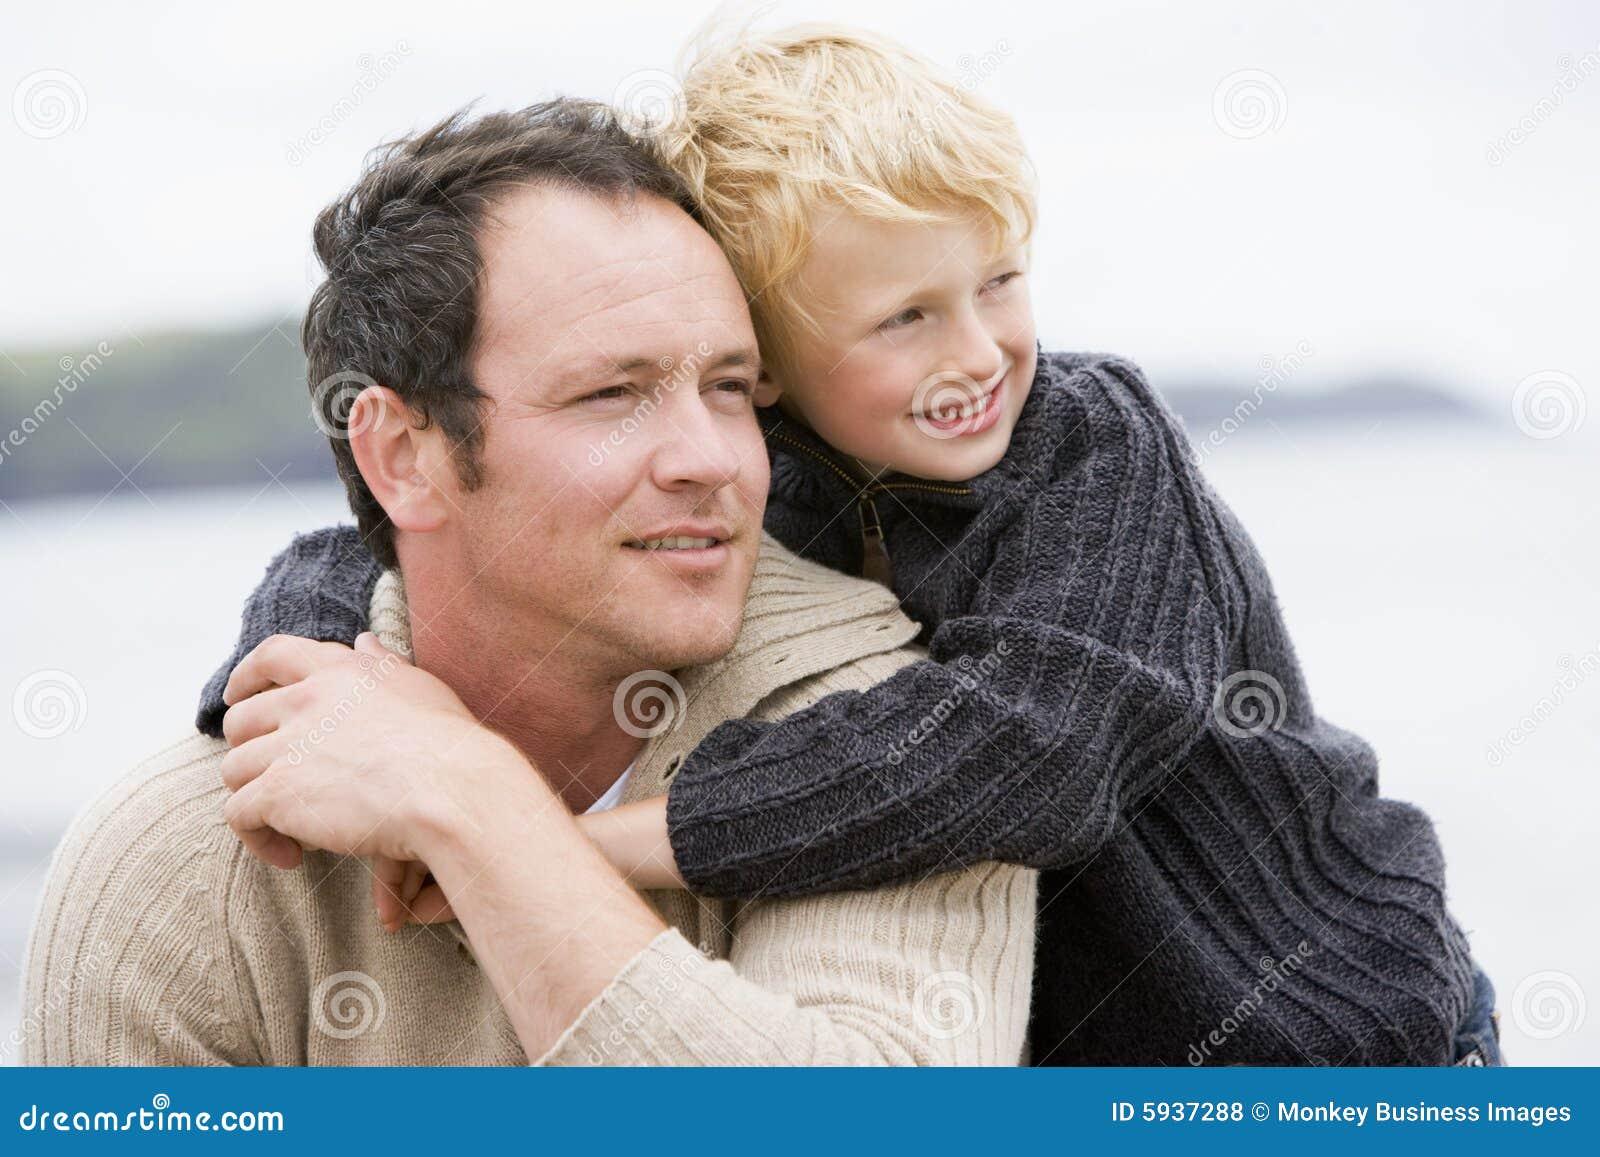 Сын и мама легли вместе 1 фотография